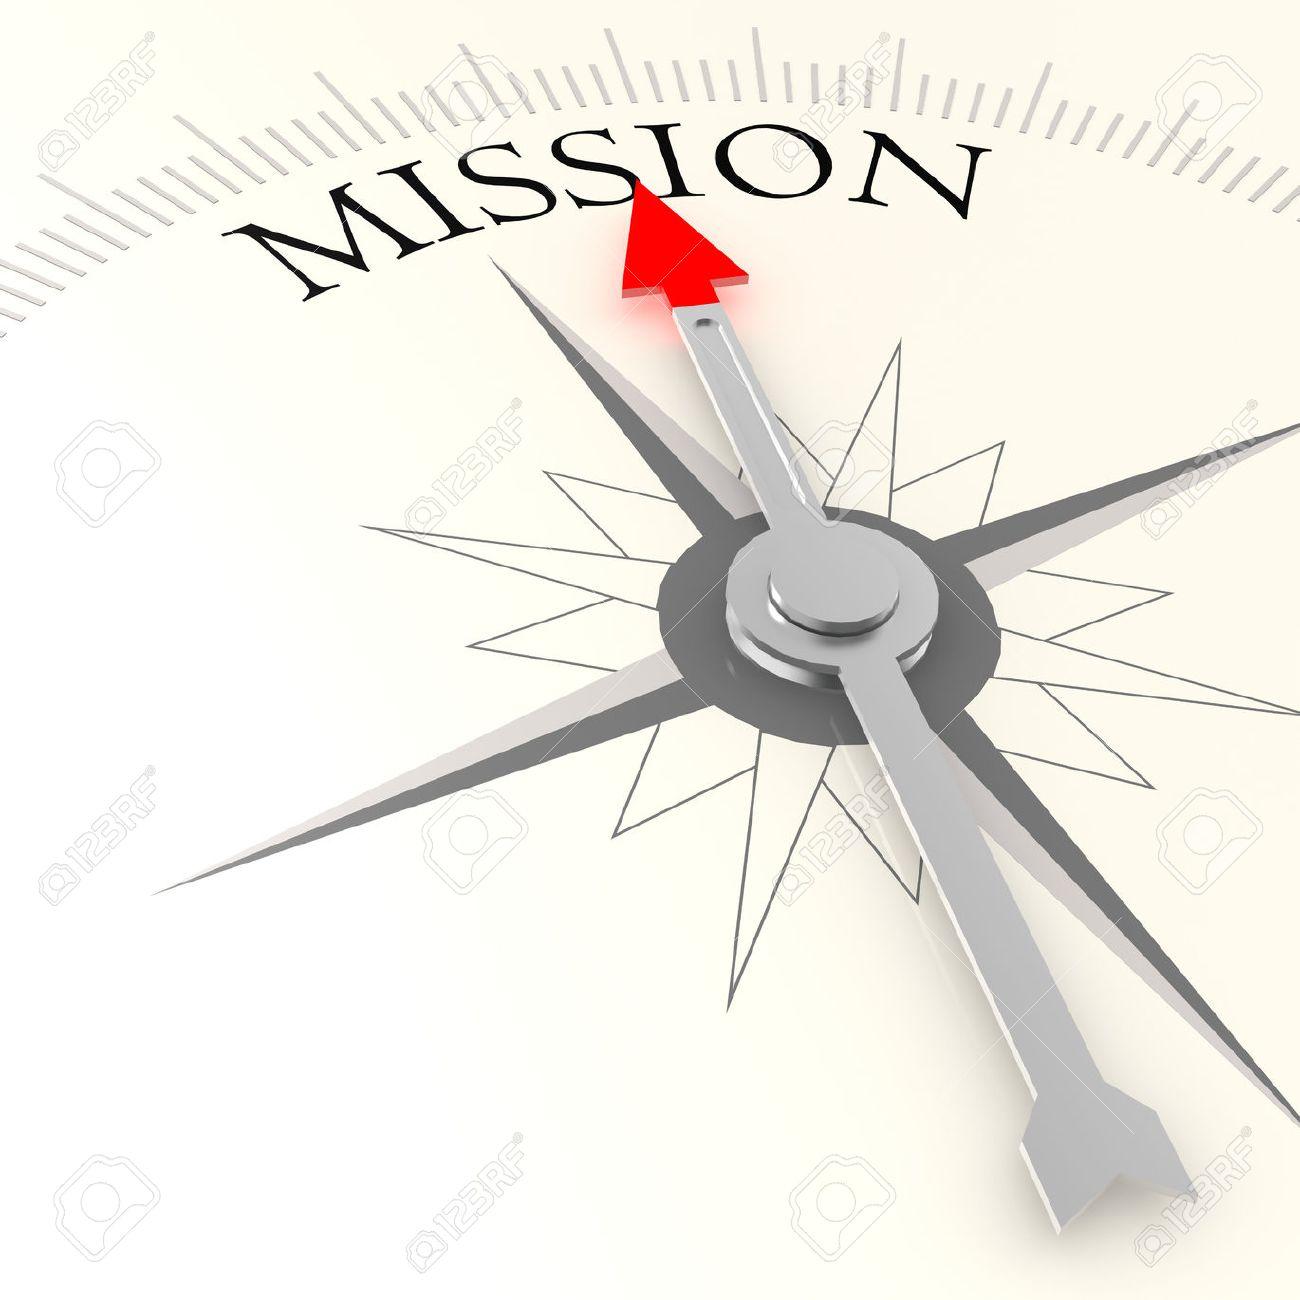 Mission compass - 33973937